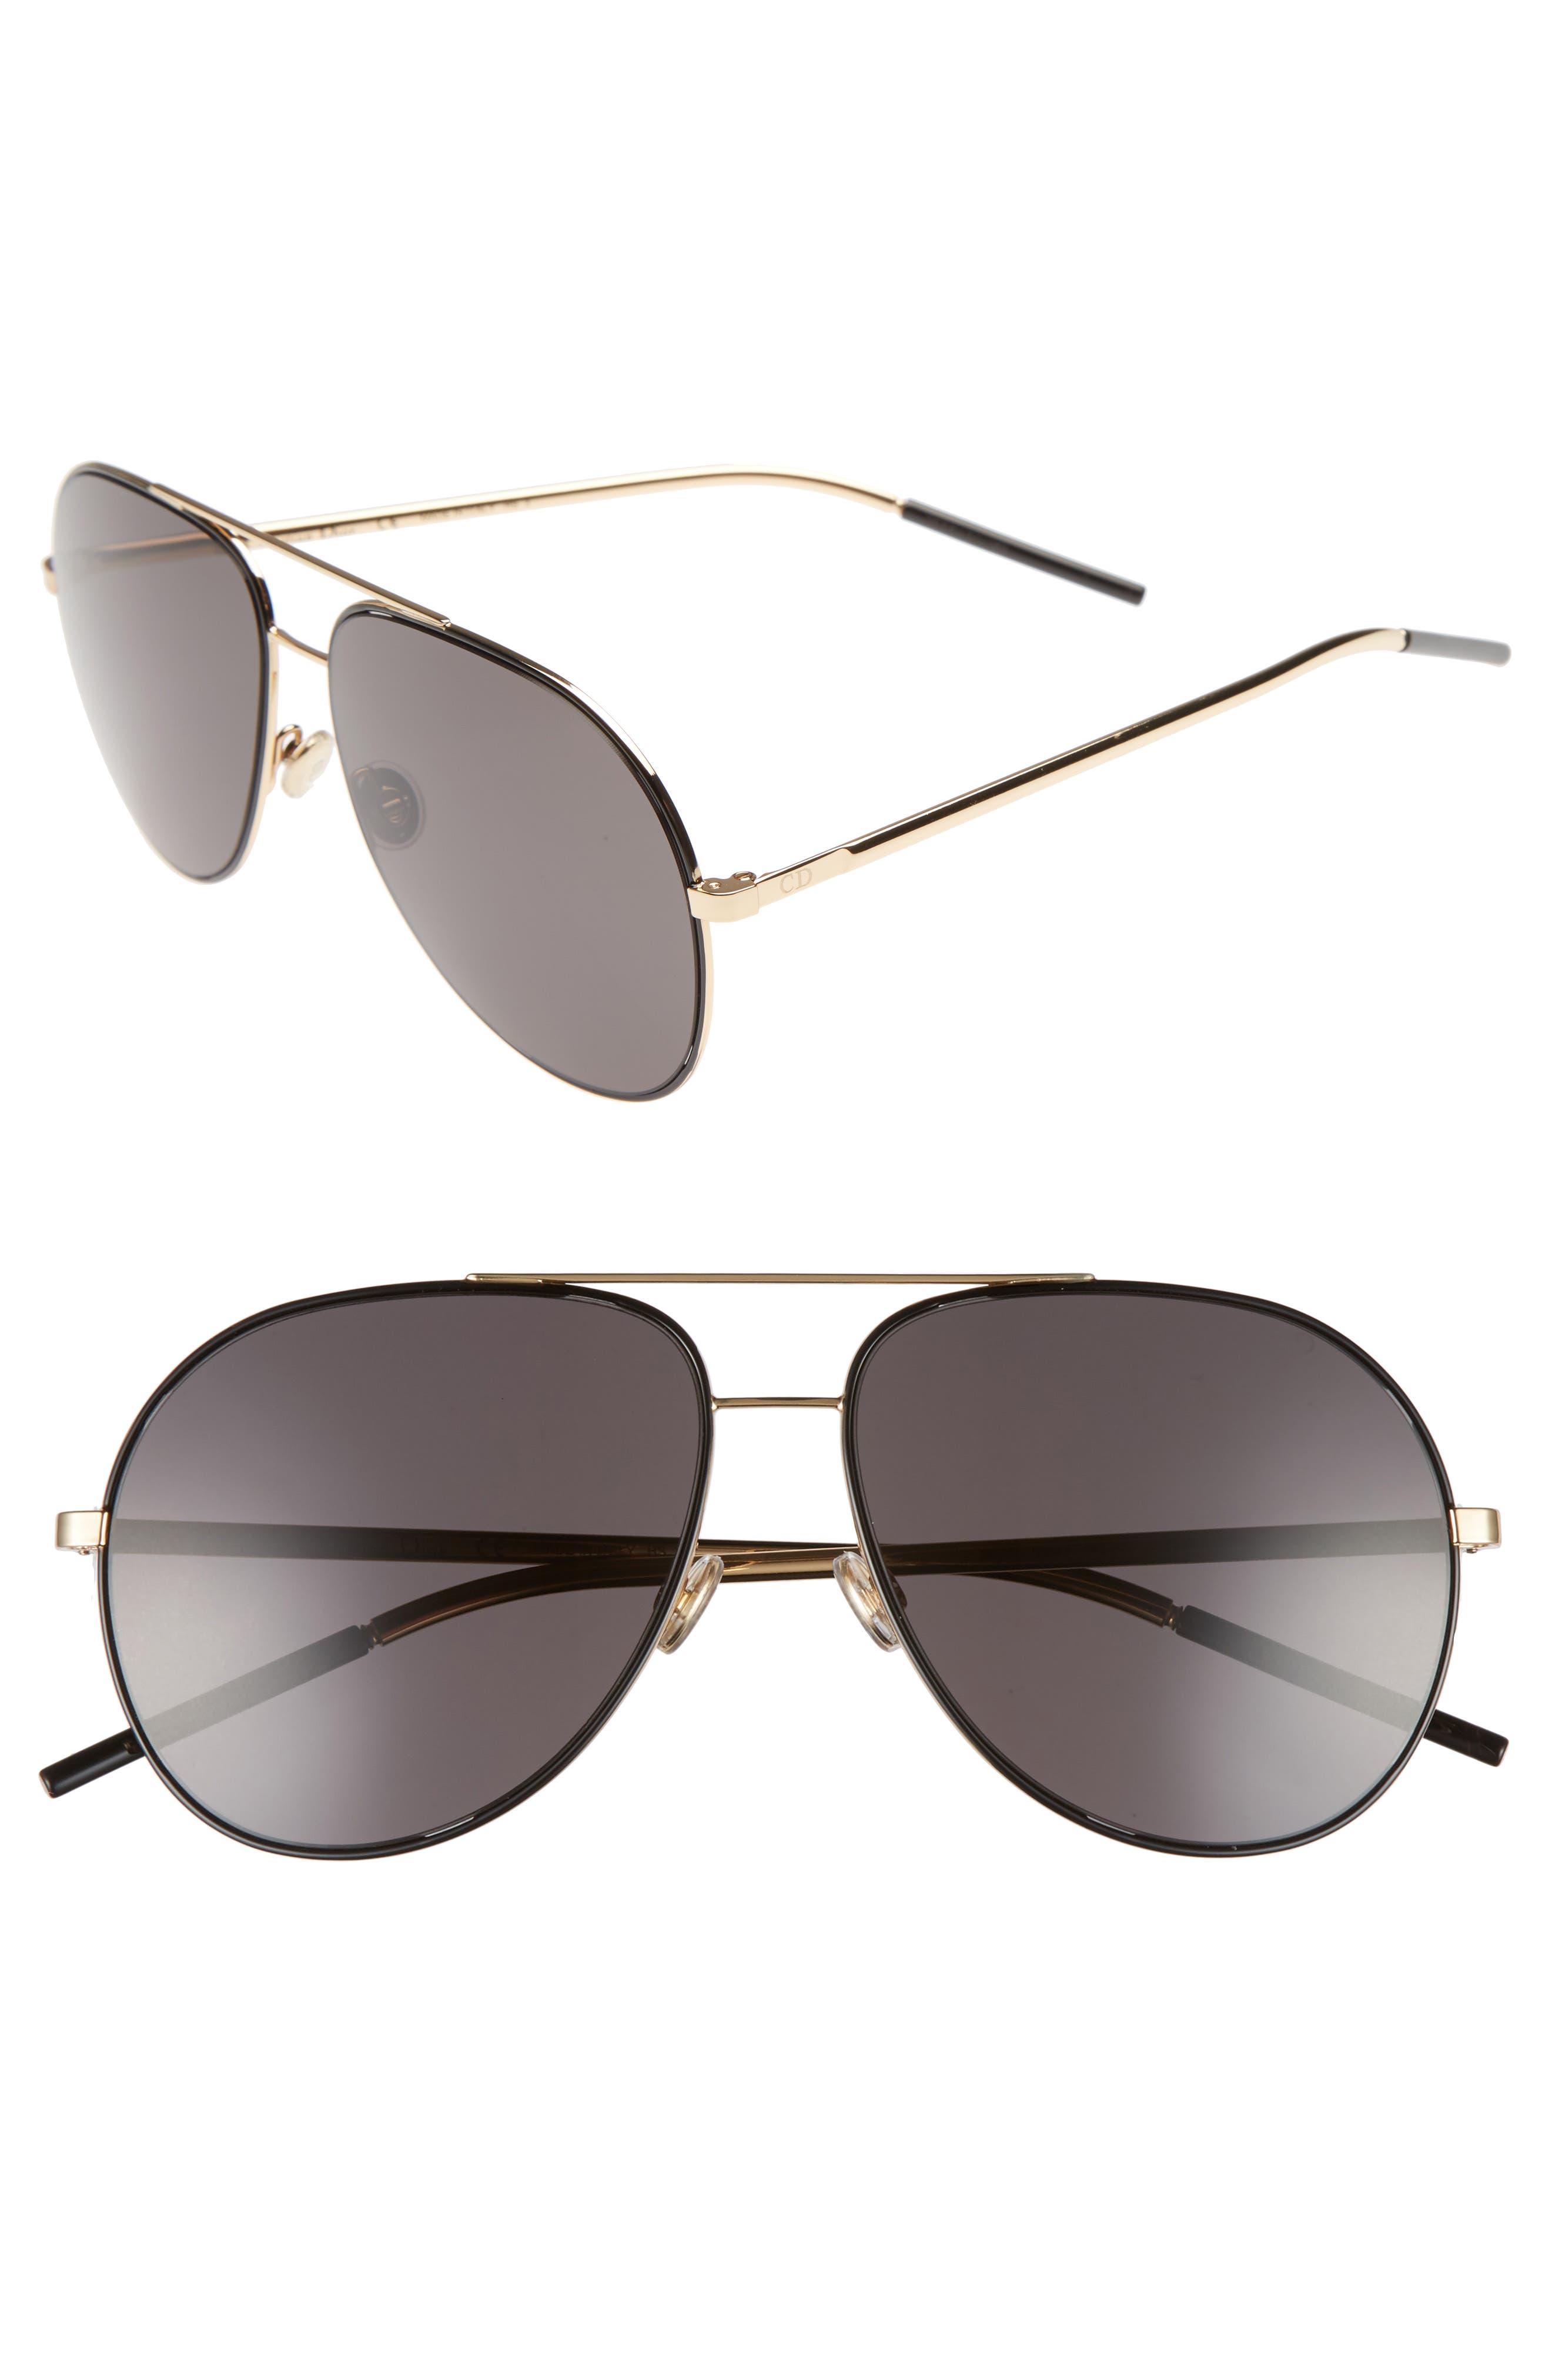 Main Image - Dior Astrals 59mm Aviator Sunglasses